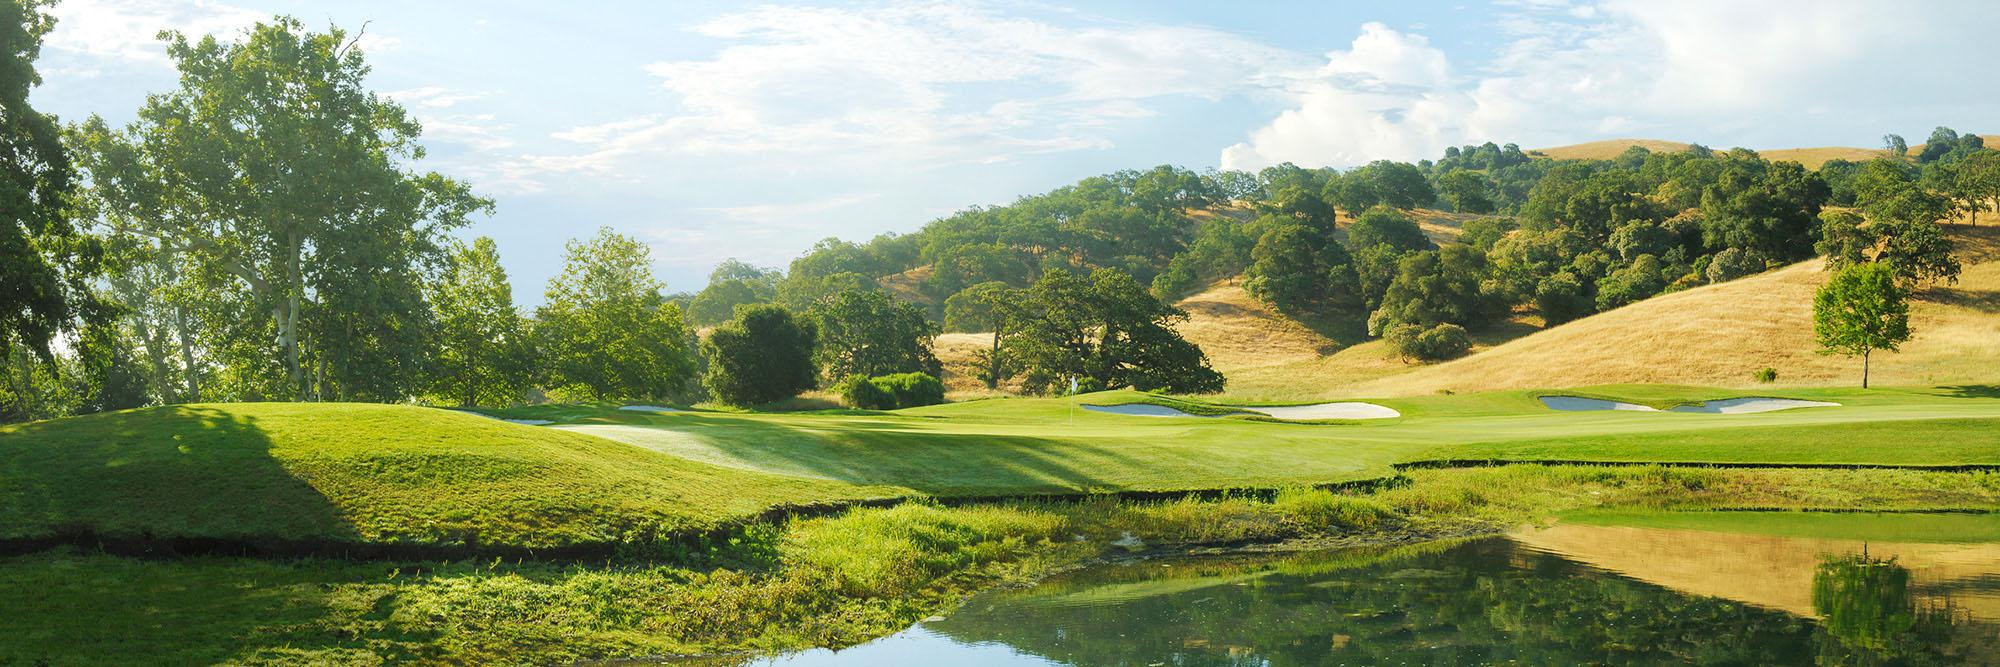 Golf Course Image - CordeValle Golf Club No. 18